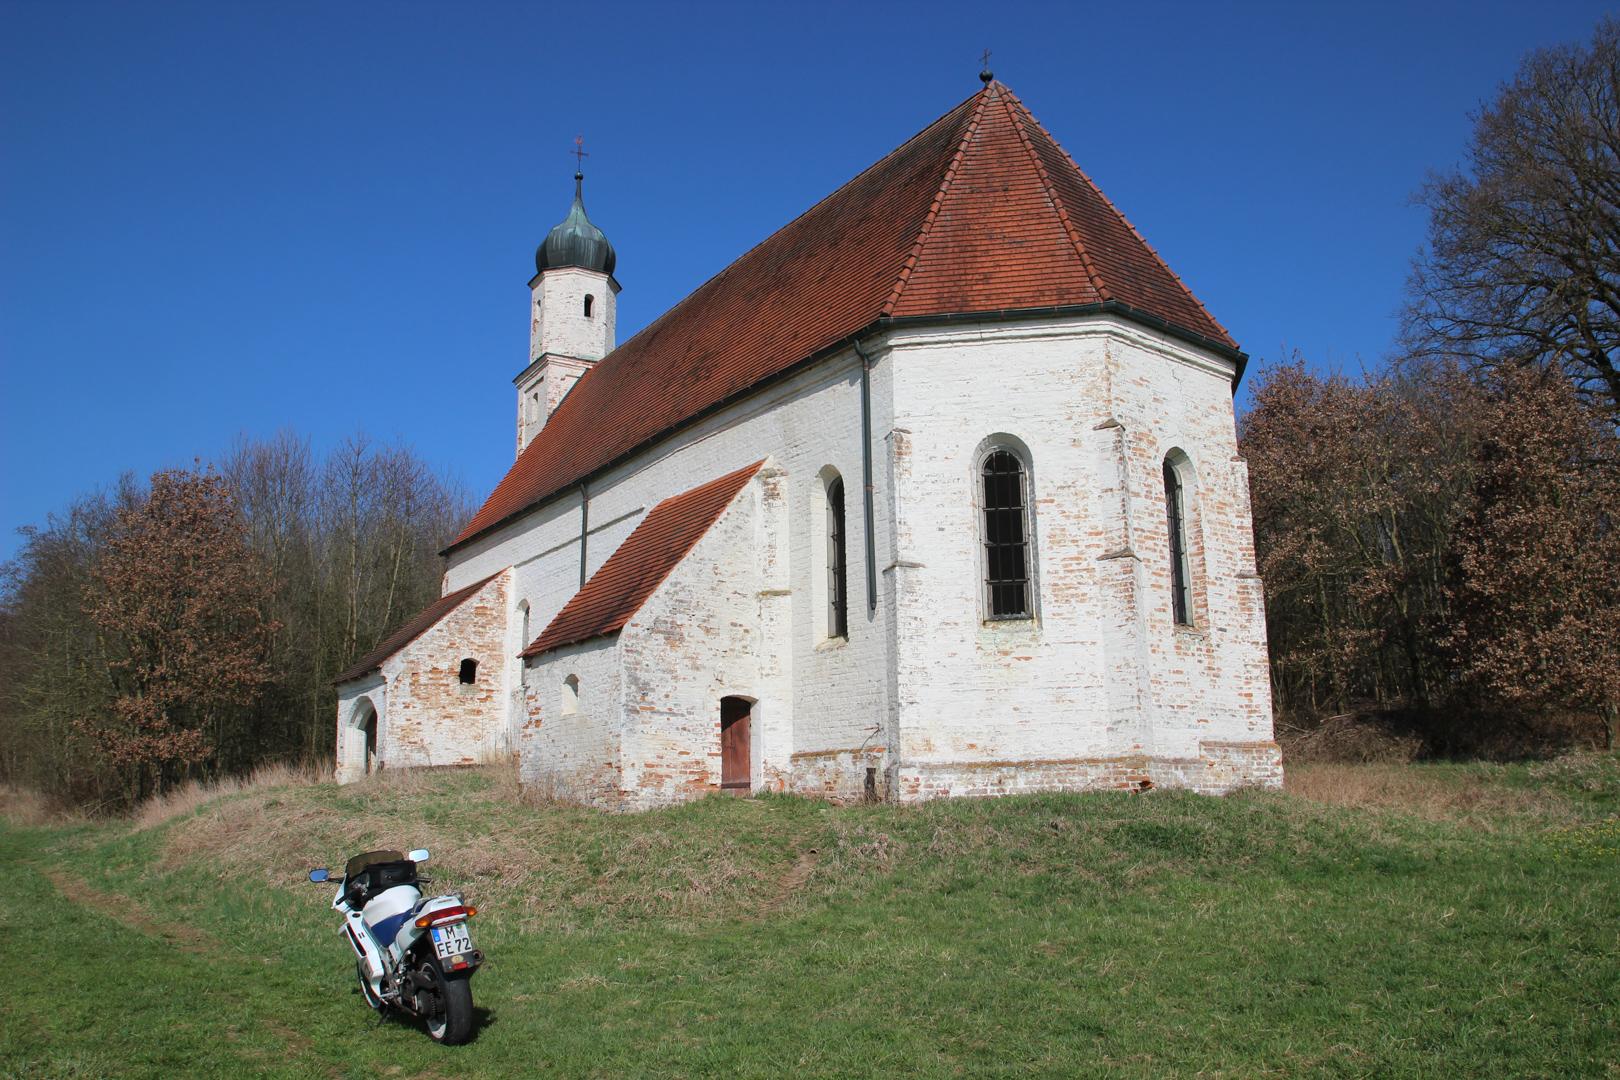 geisterkirche thomas bach